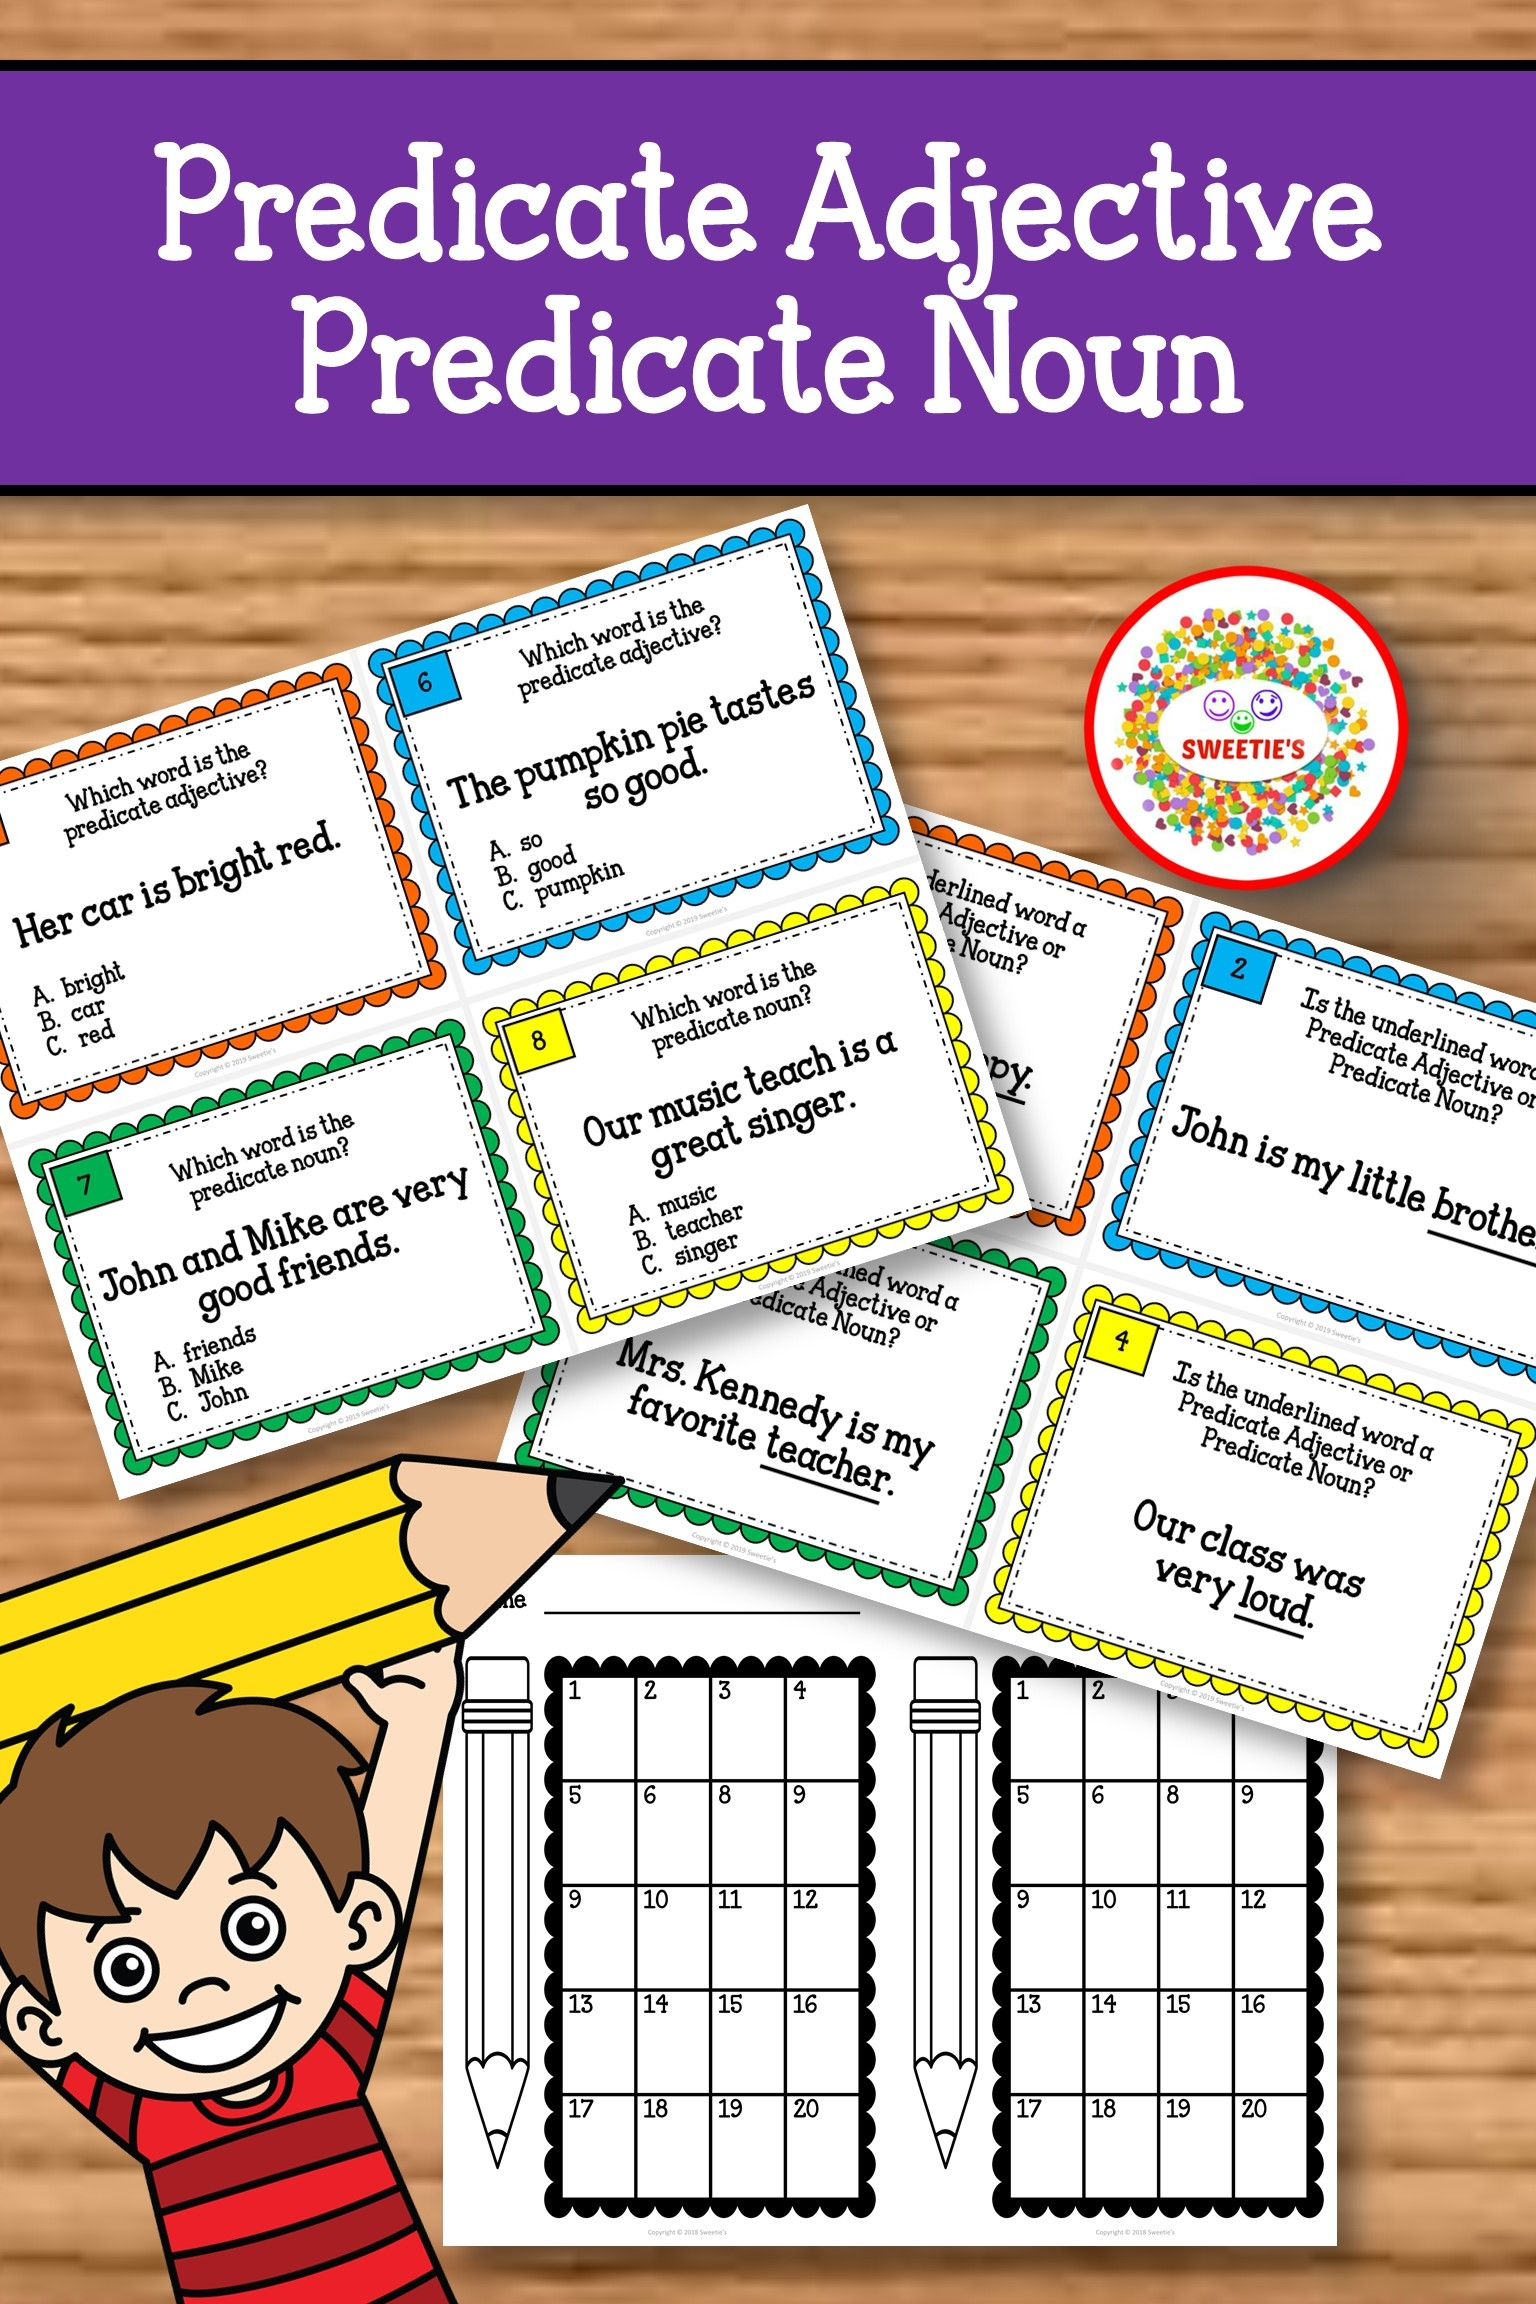 Predicate Adjective Predicate Noun Task Cards